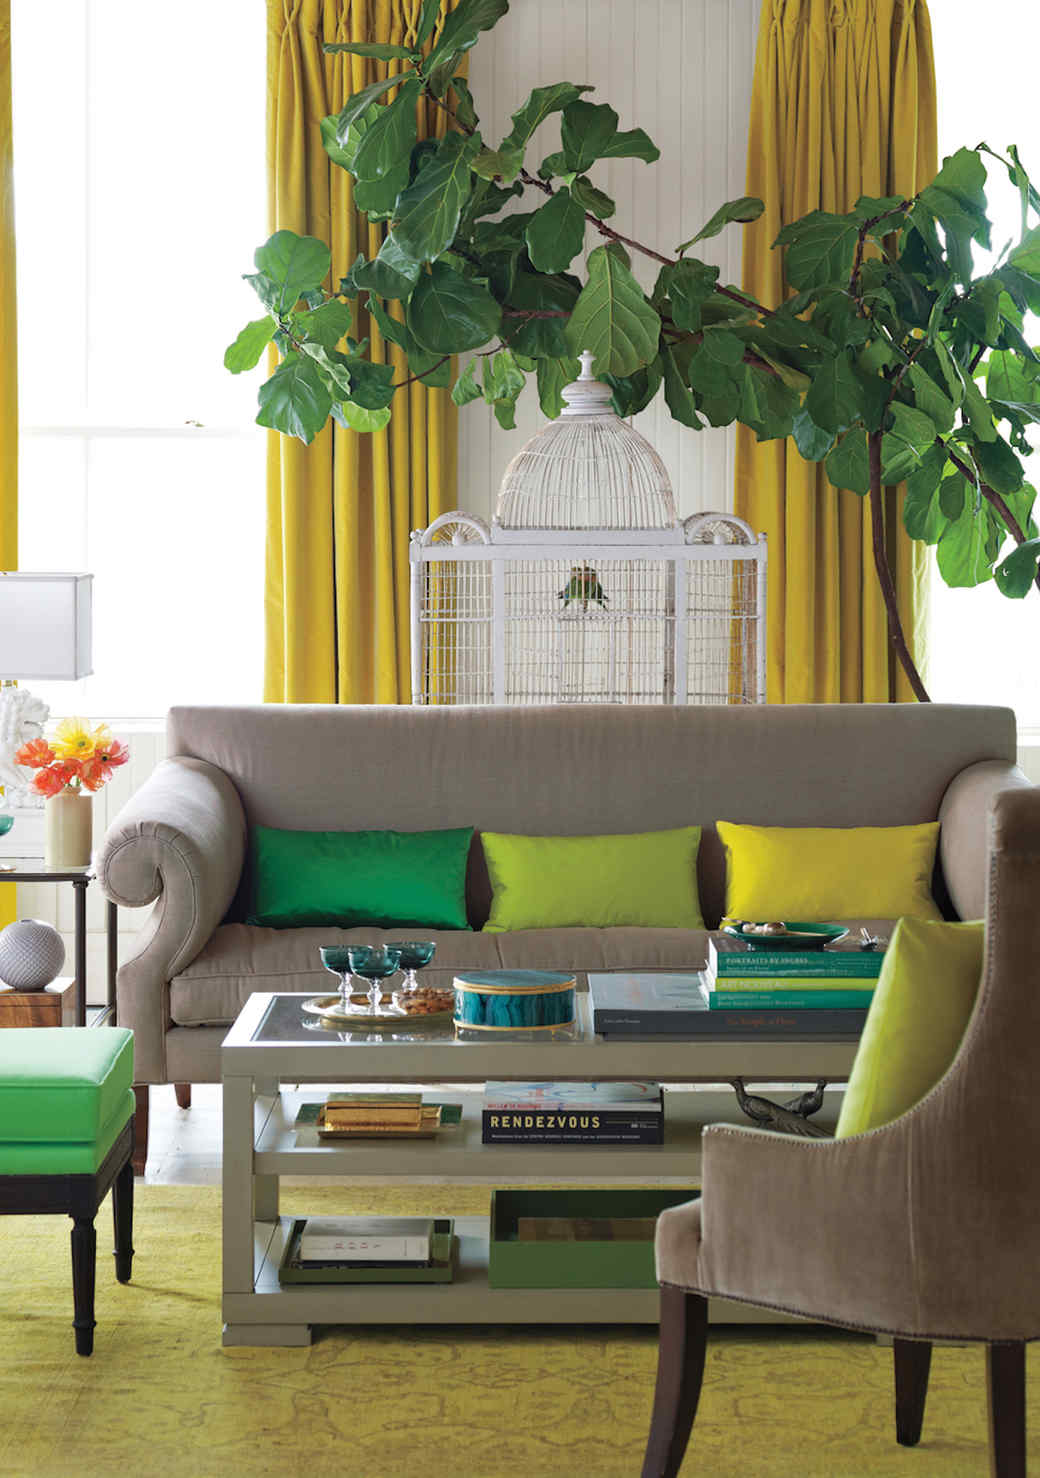 green-yellow-decor-1016.jpg (skyword:349133)